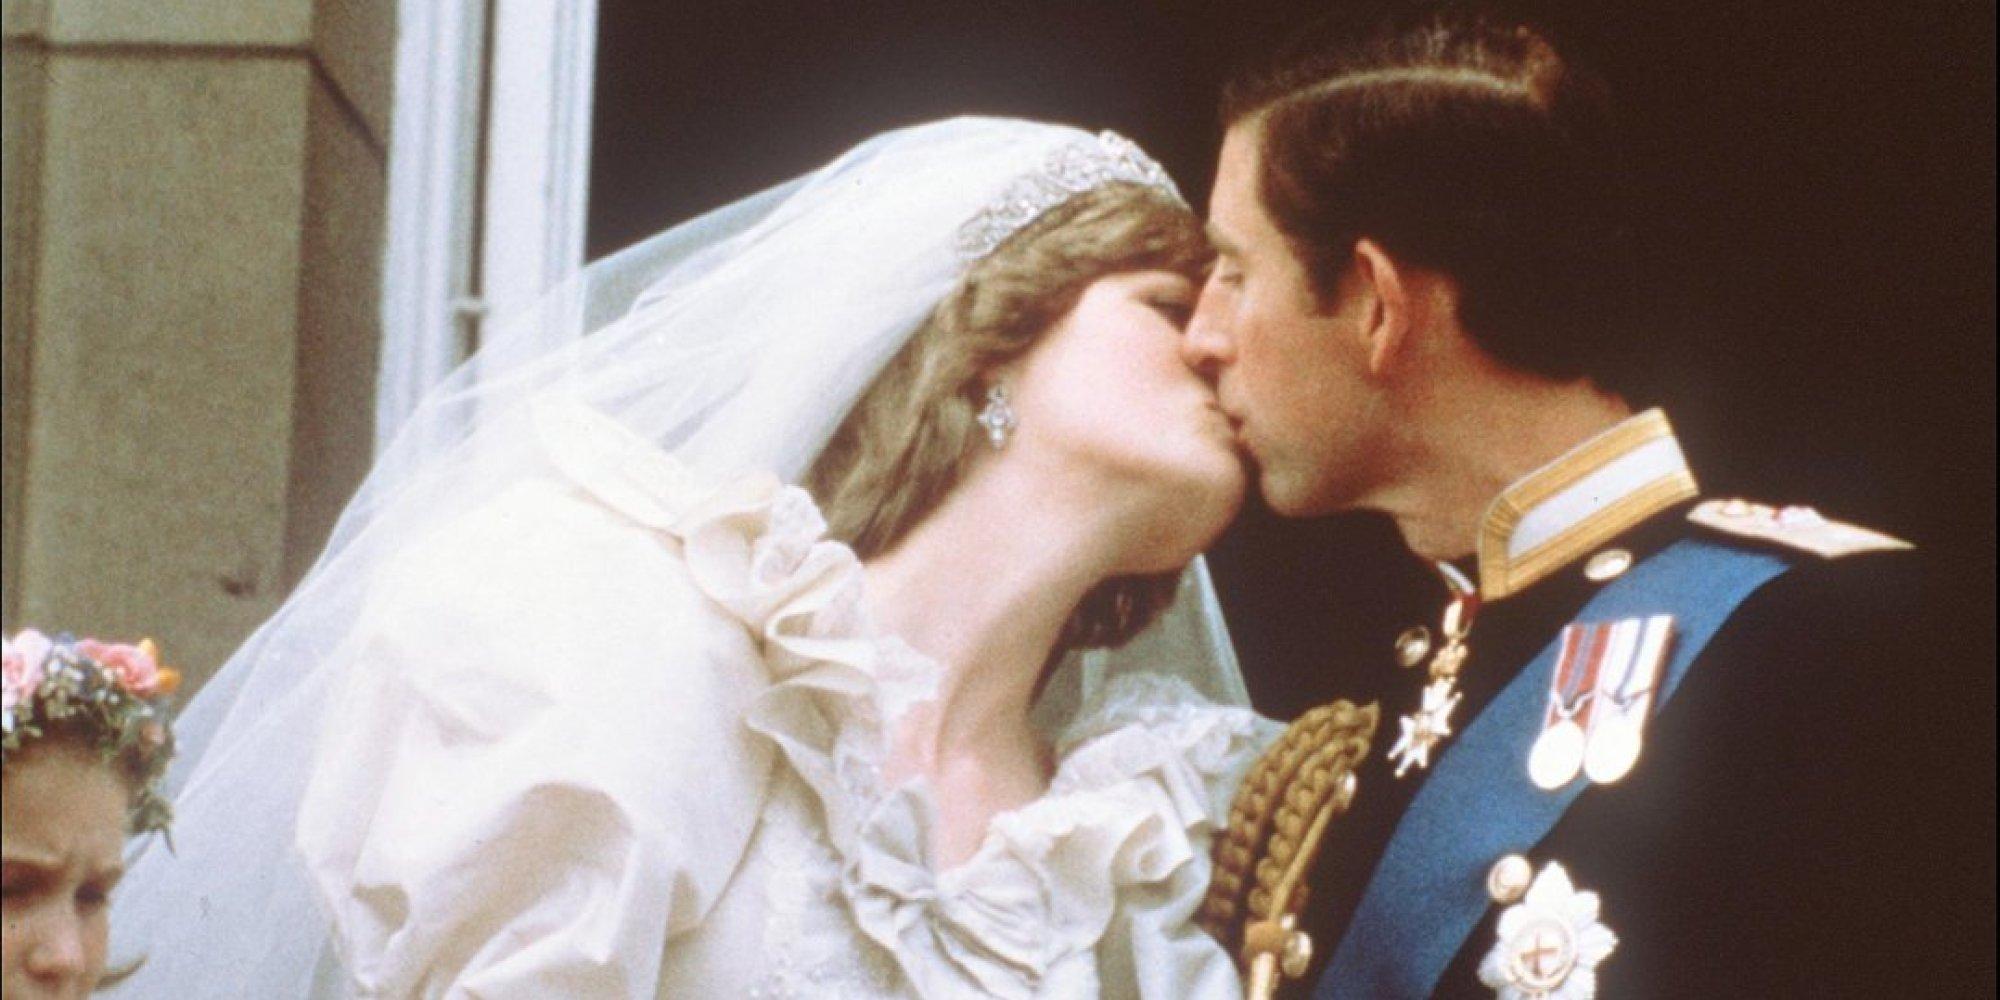 https://s-i.huffpost.com/gen/1936344/images/o-PRINCESS-DIANA-PRINCE-CHARLES-WEDDING-facebook.jpg